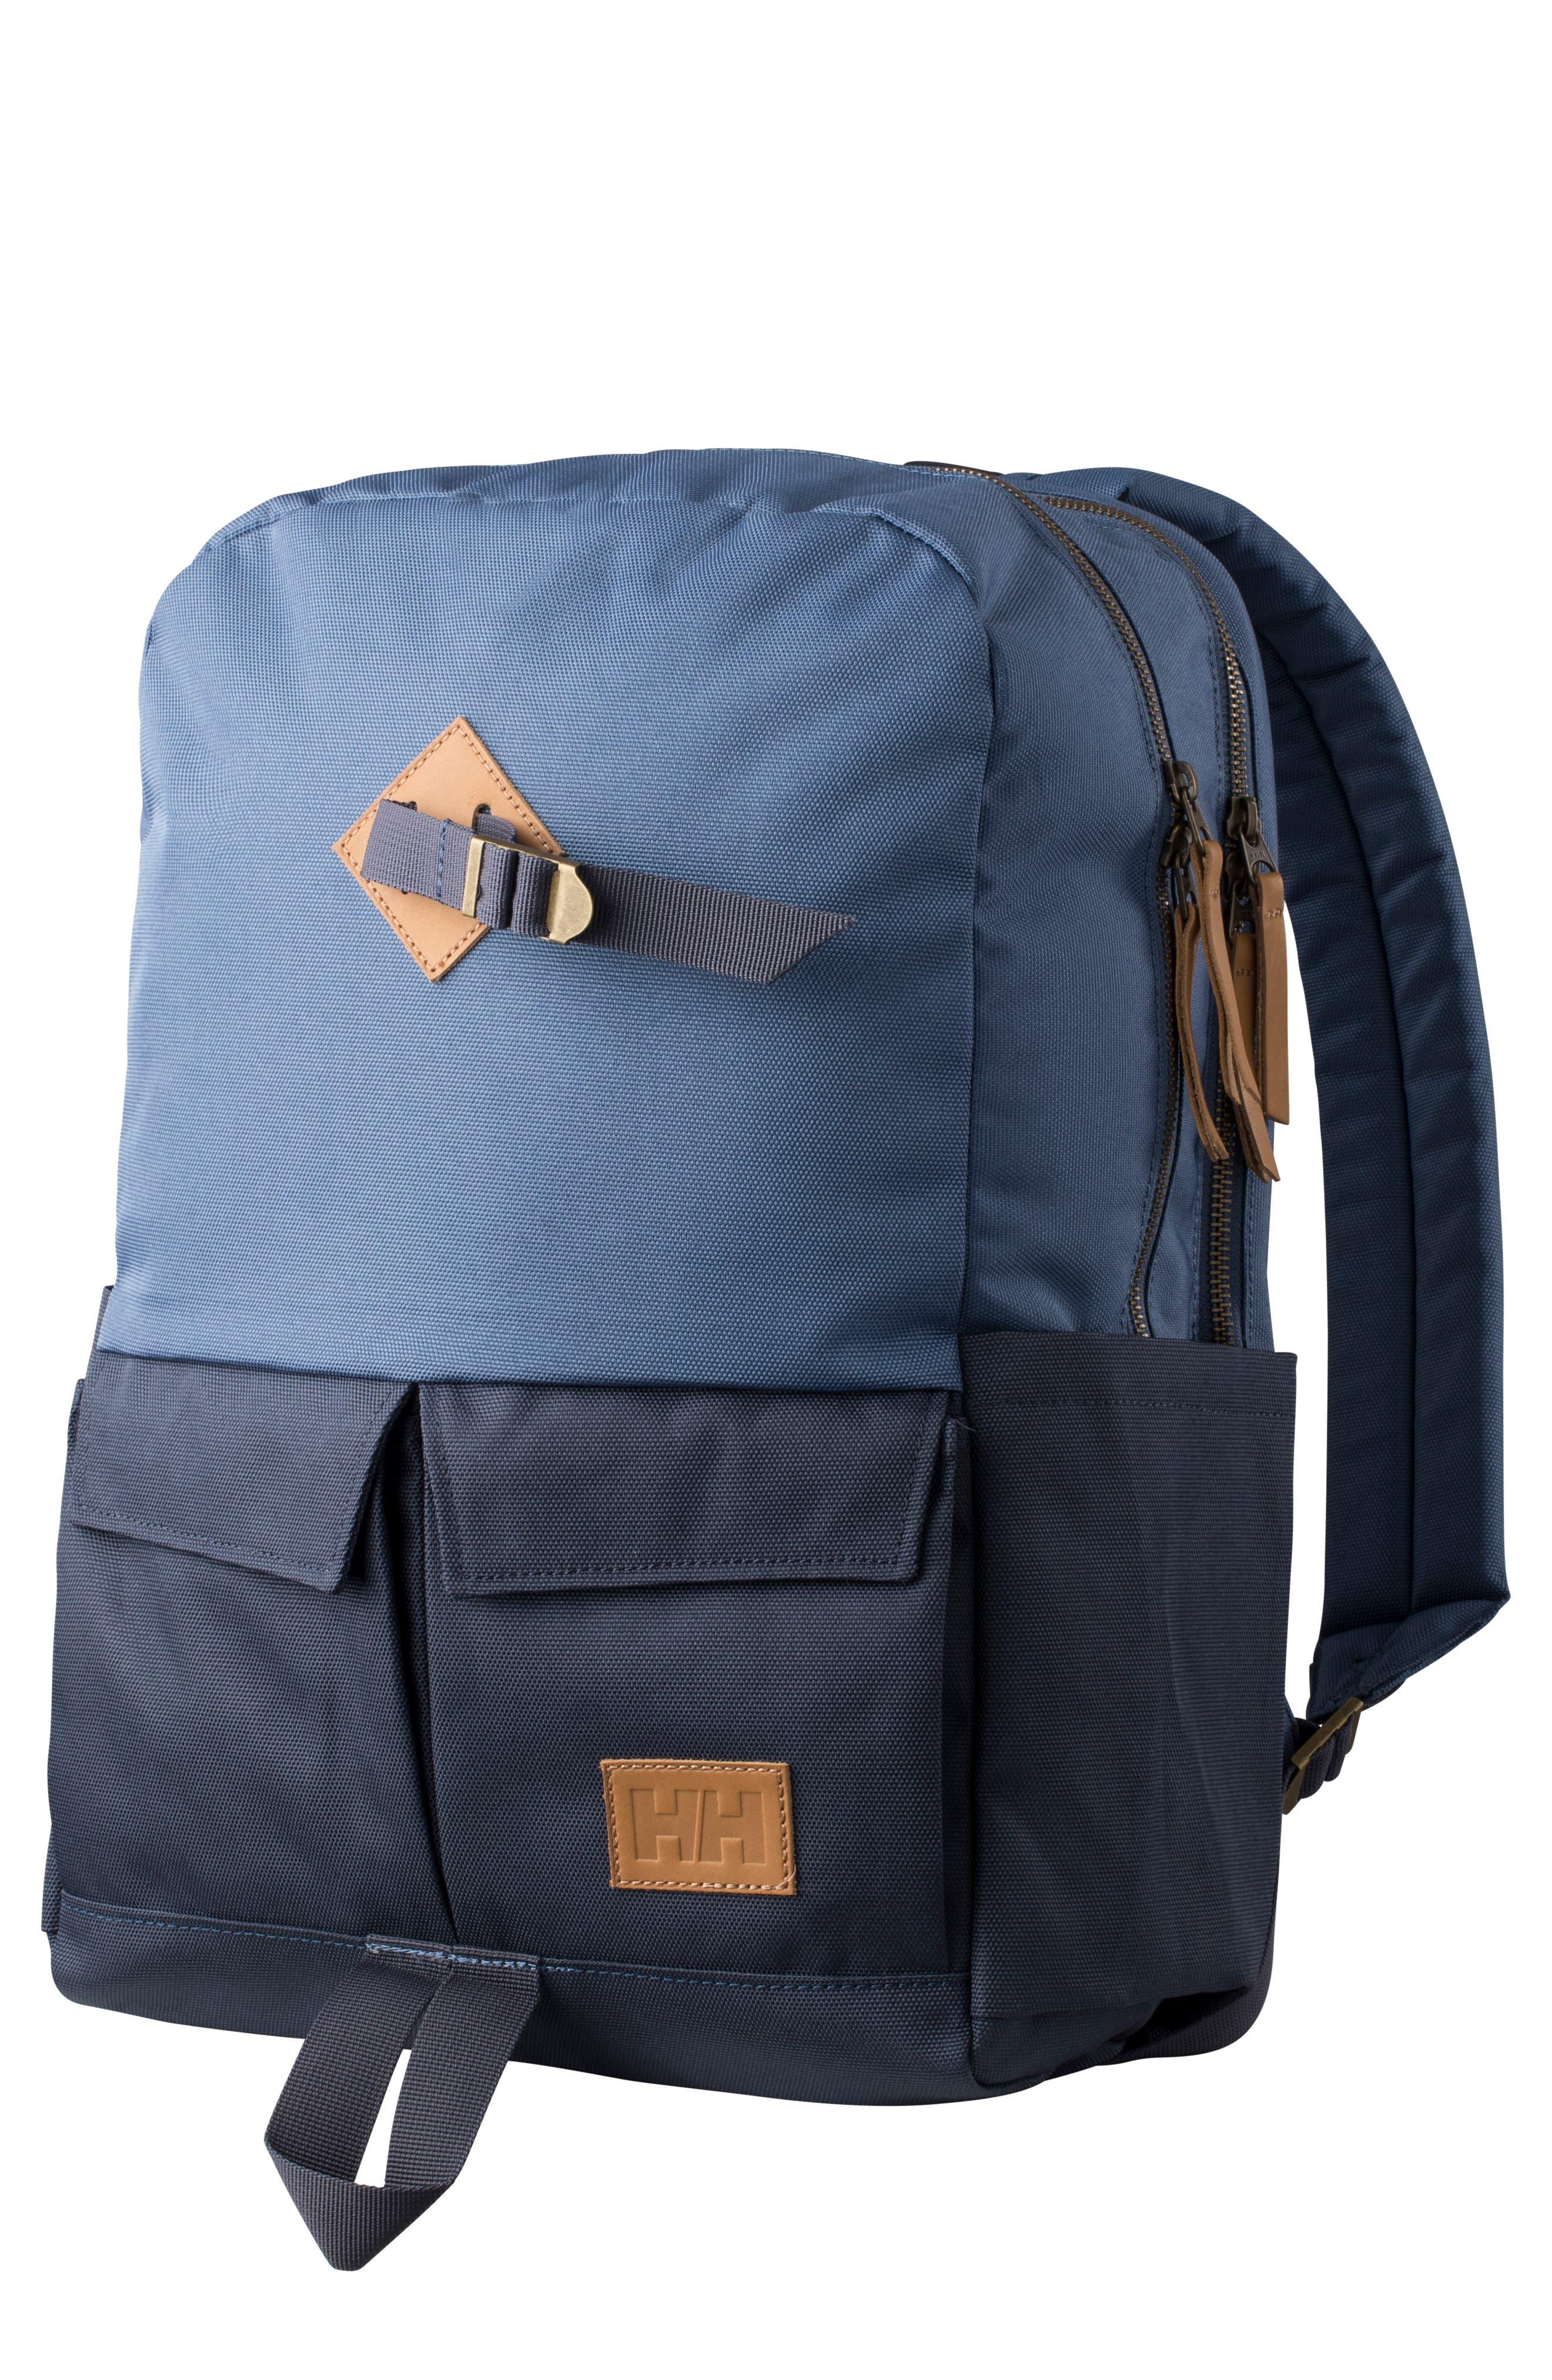 Bergen Backpack,                         Main,                         color, GRAPHITE BLUE